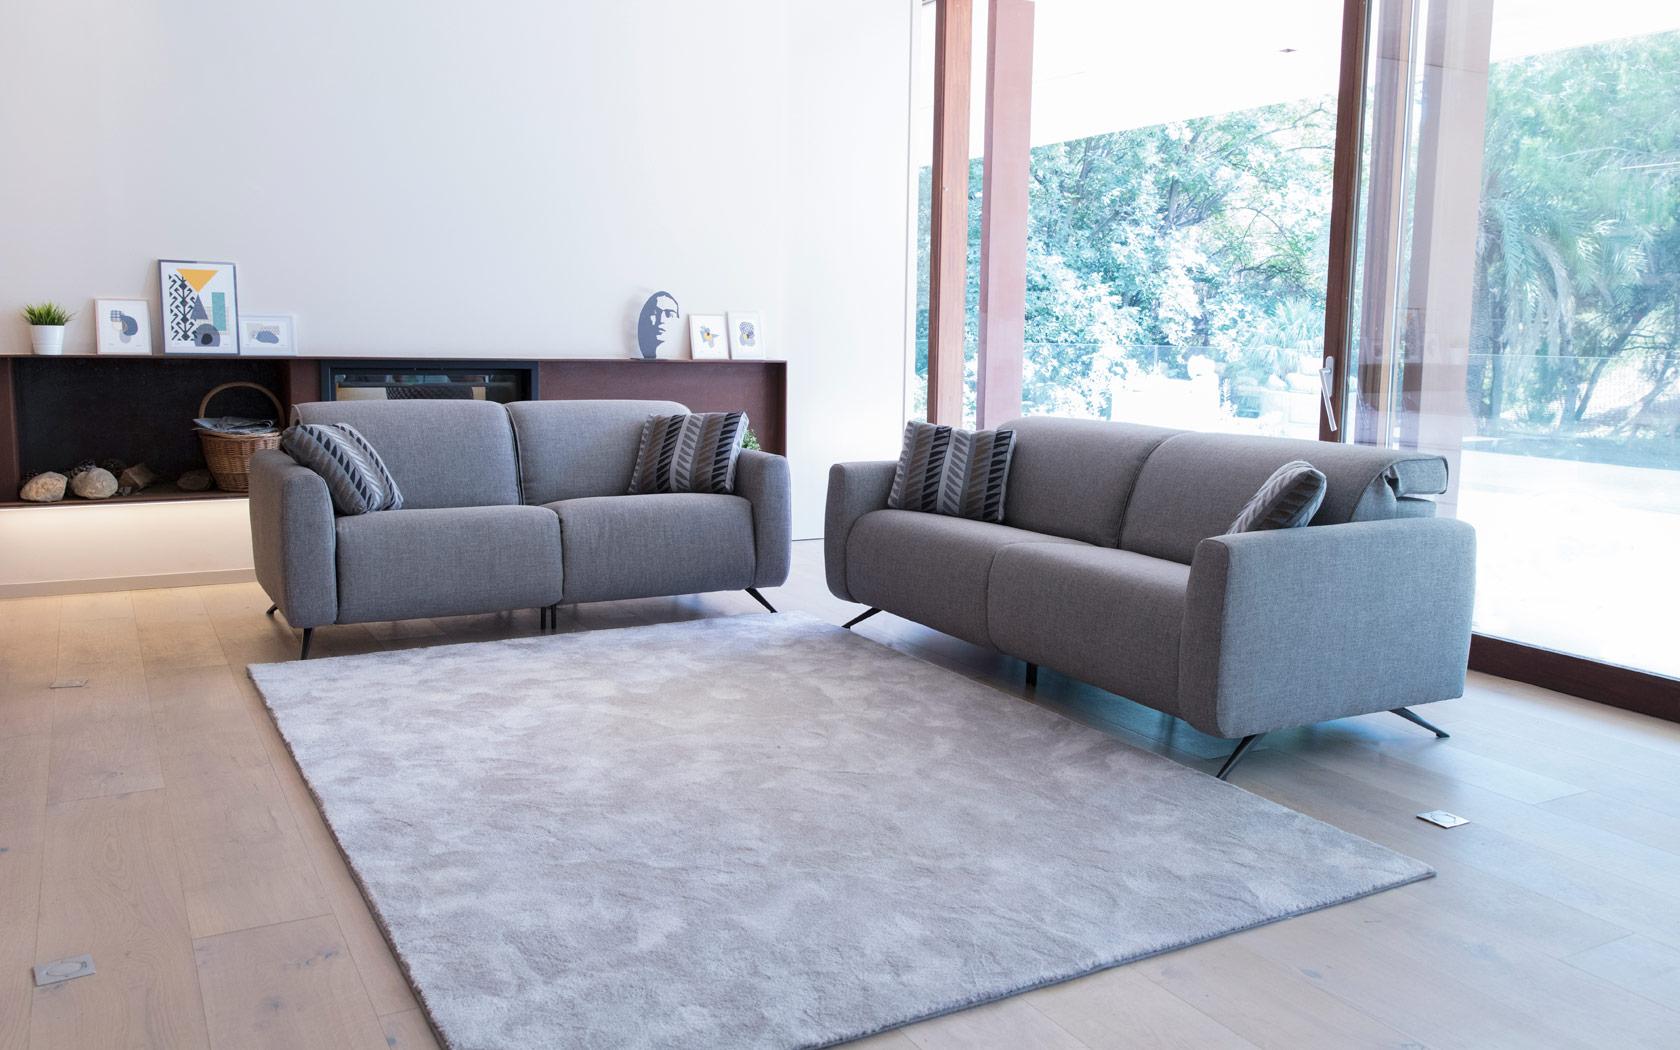 Baltia sofa relax 2020 05